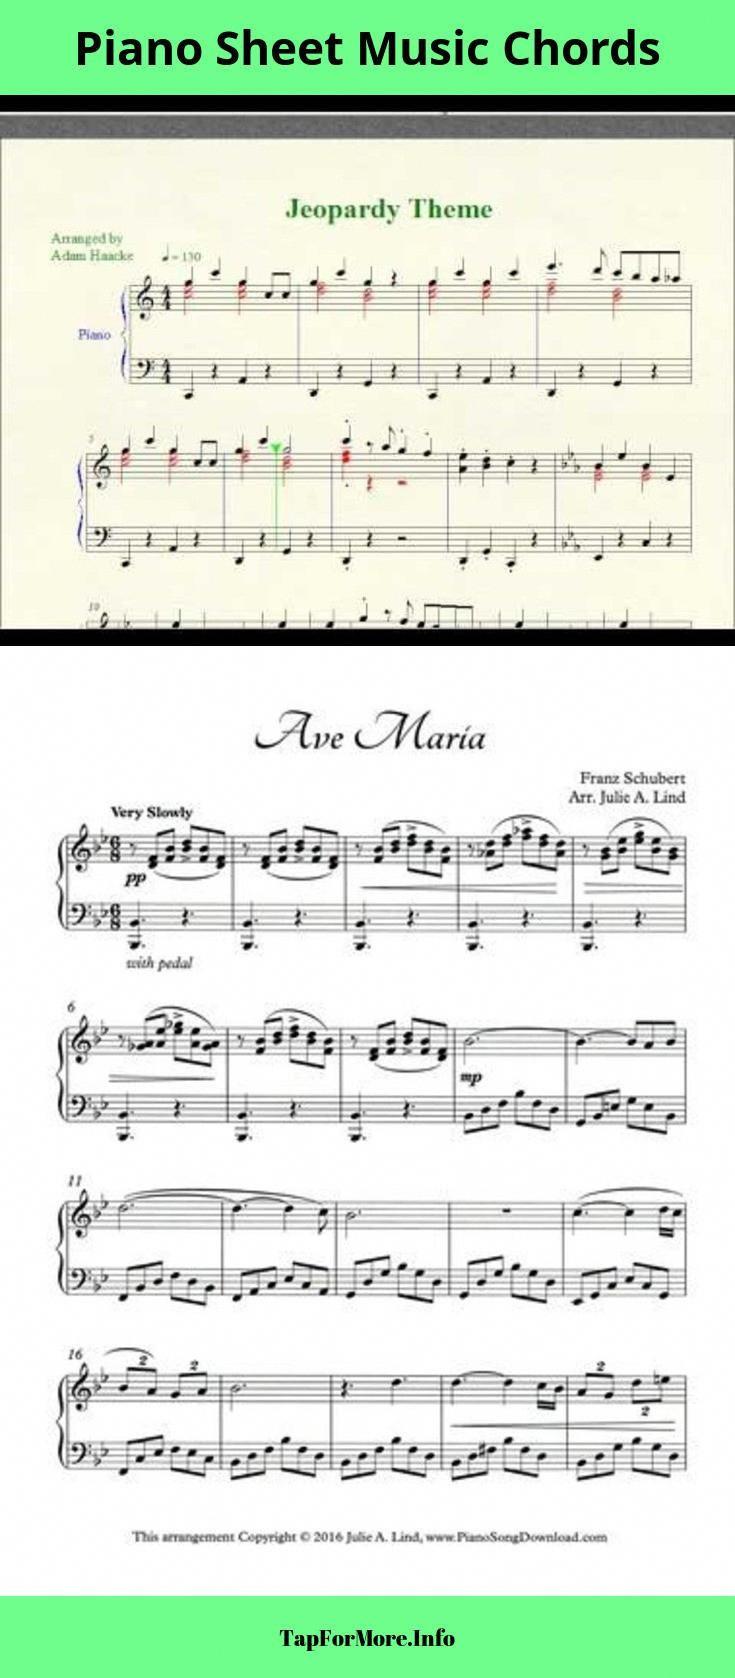 How to read piano sheet music music chords sheet music